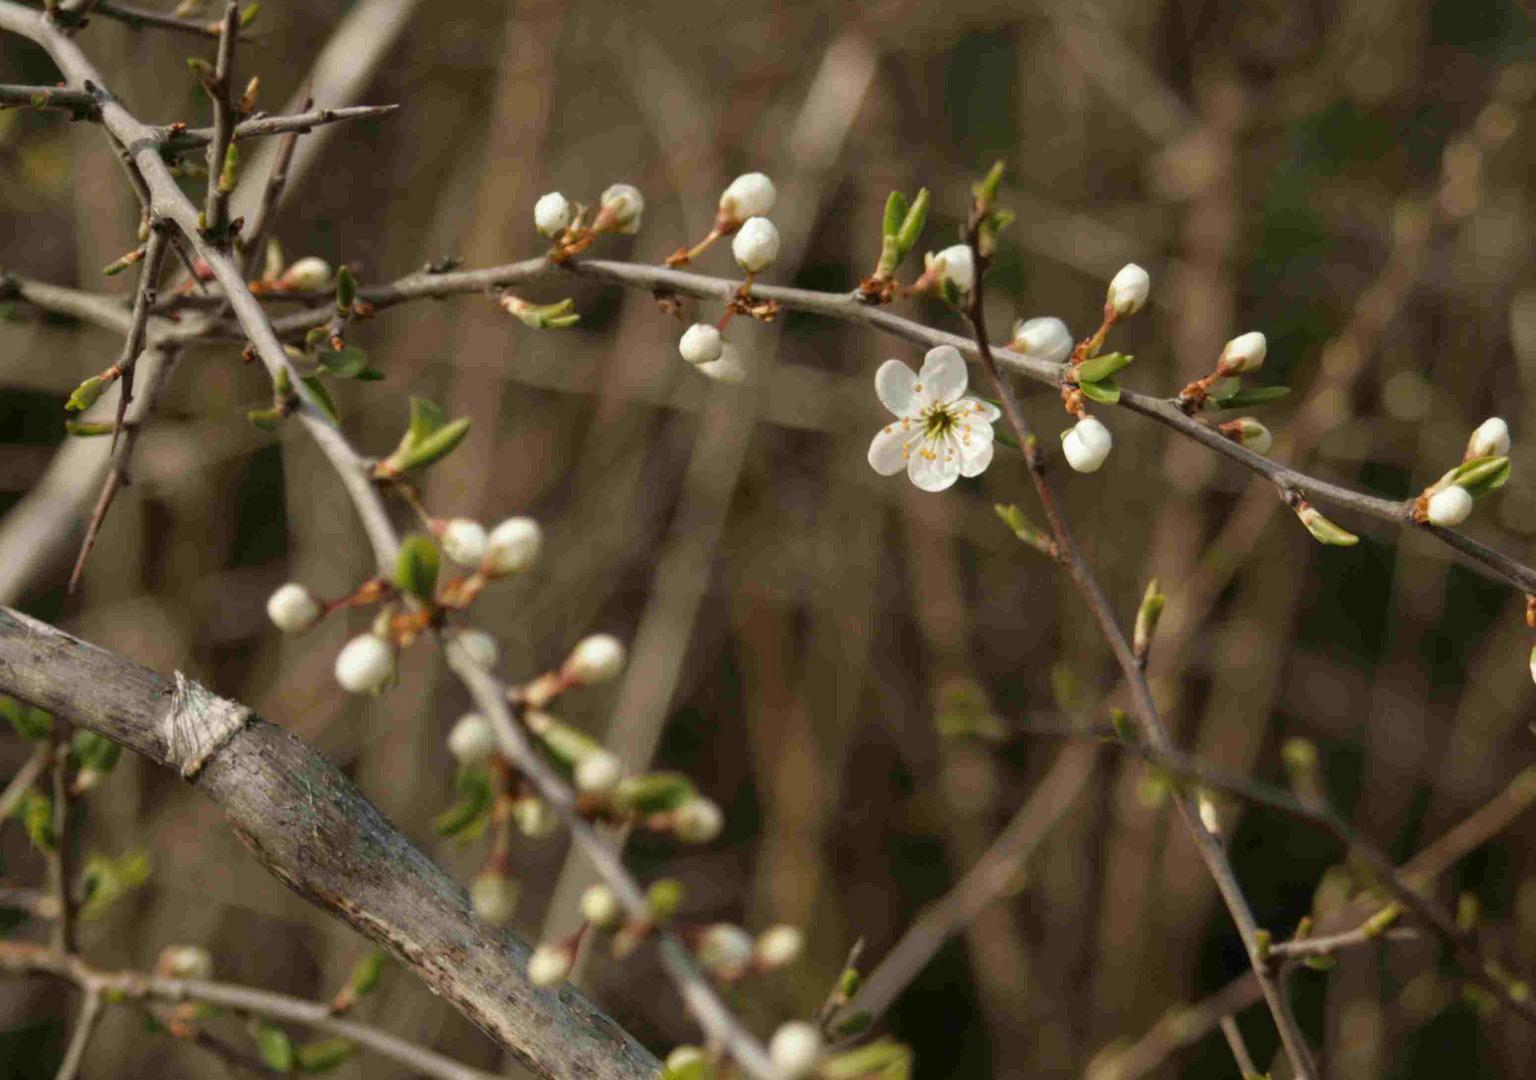 Erste Blüte im Frühjahr